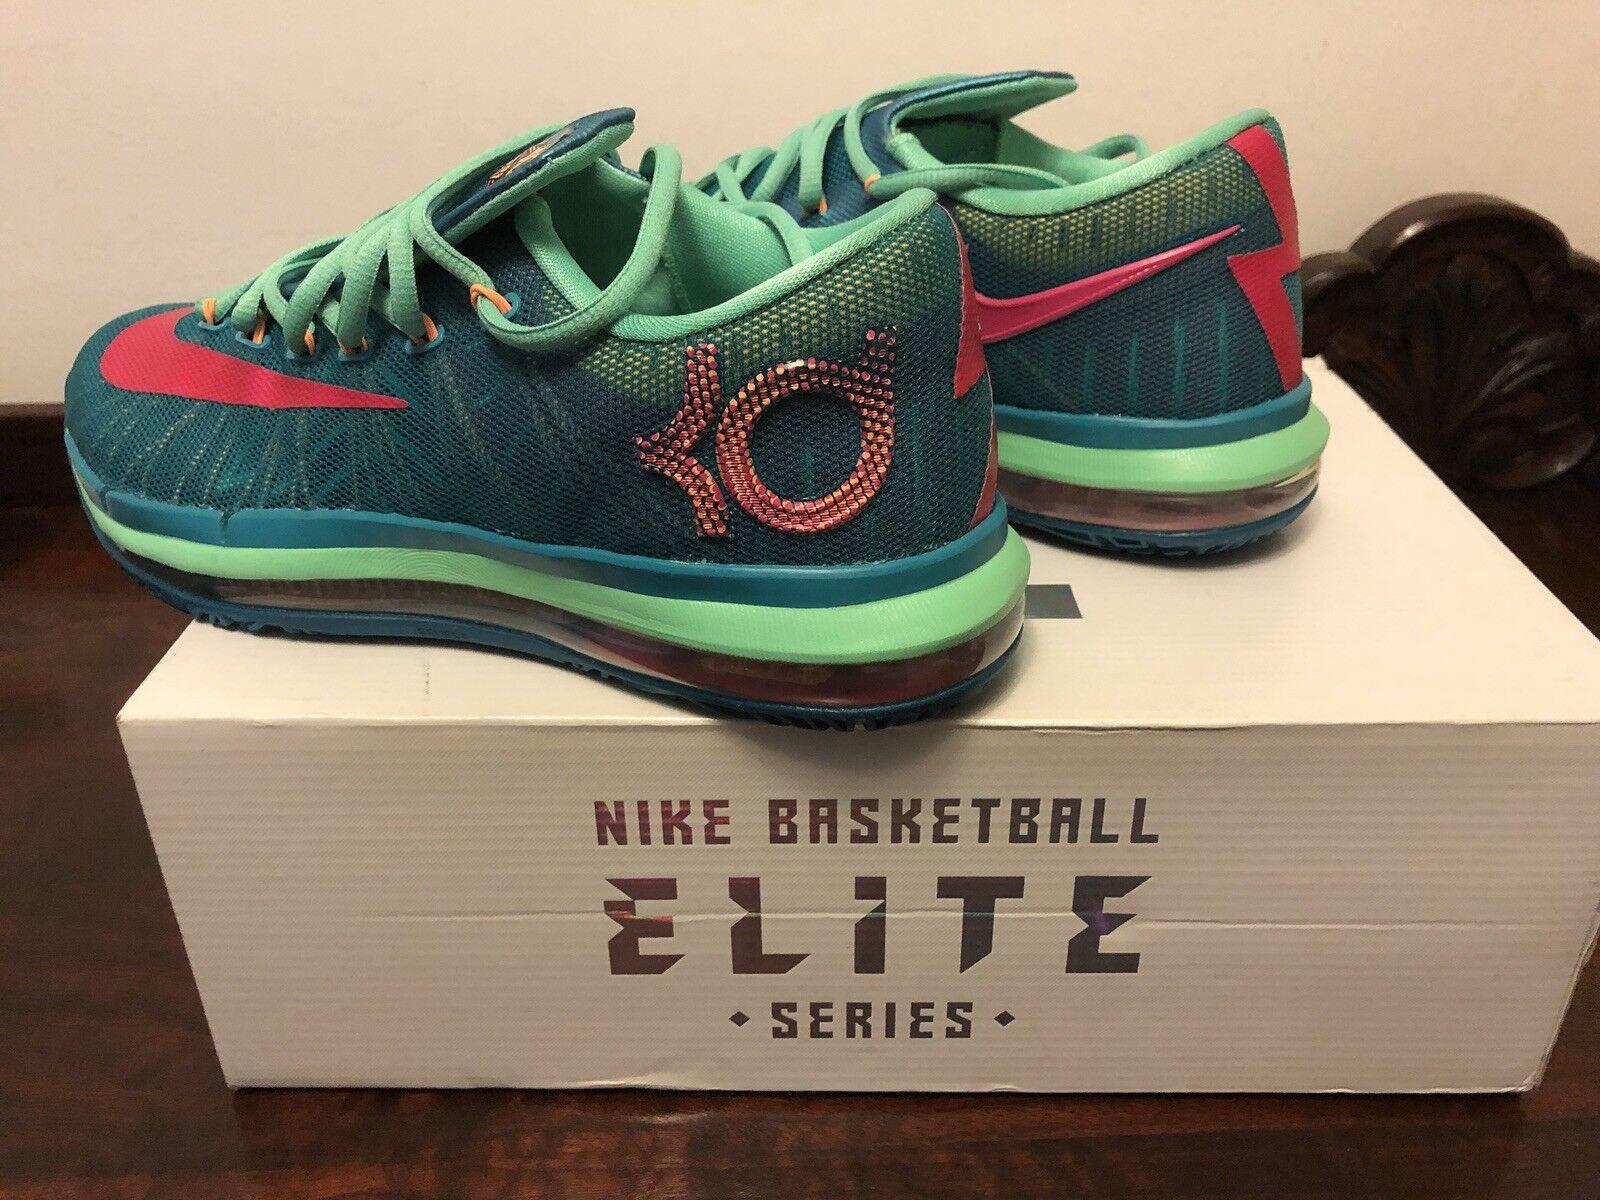 Nike KD VI 6 Elite (642838-300) Hero Collection Turbo Green/Pink Size 7.5